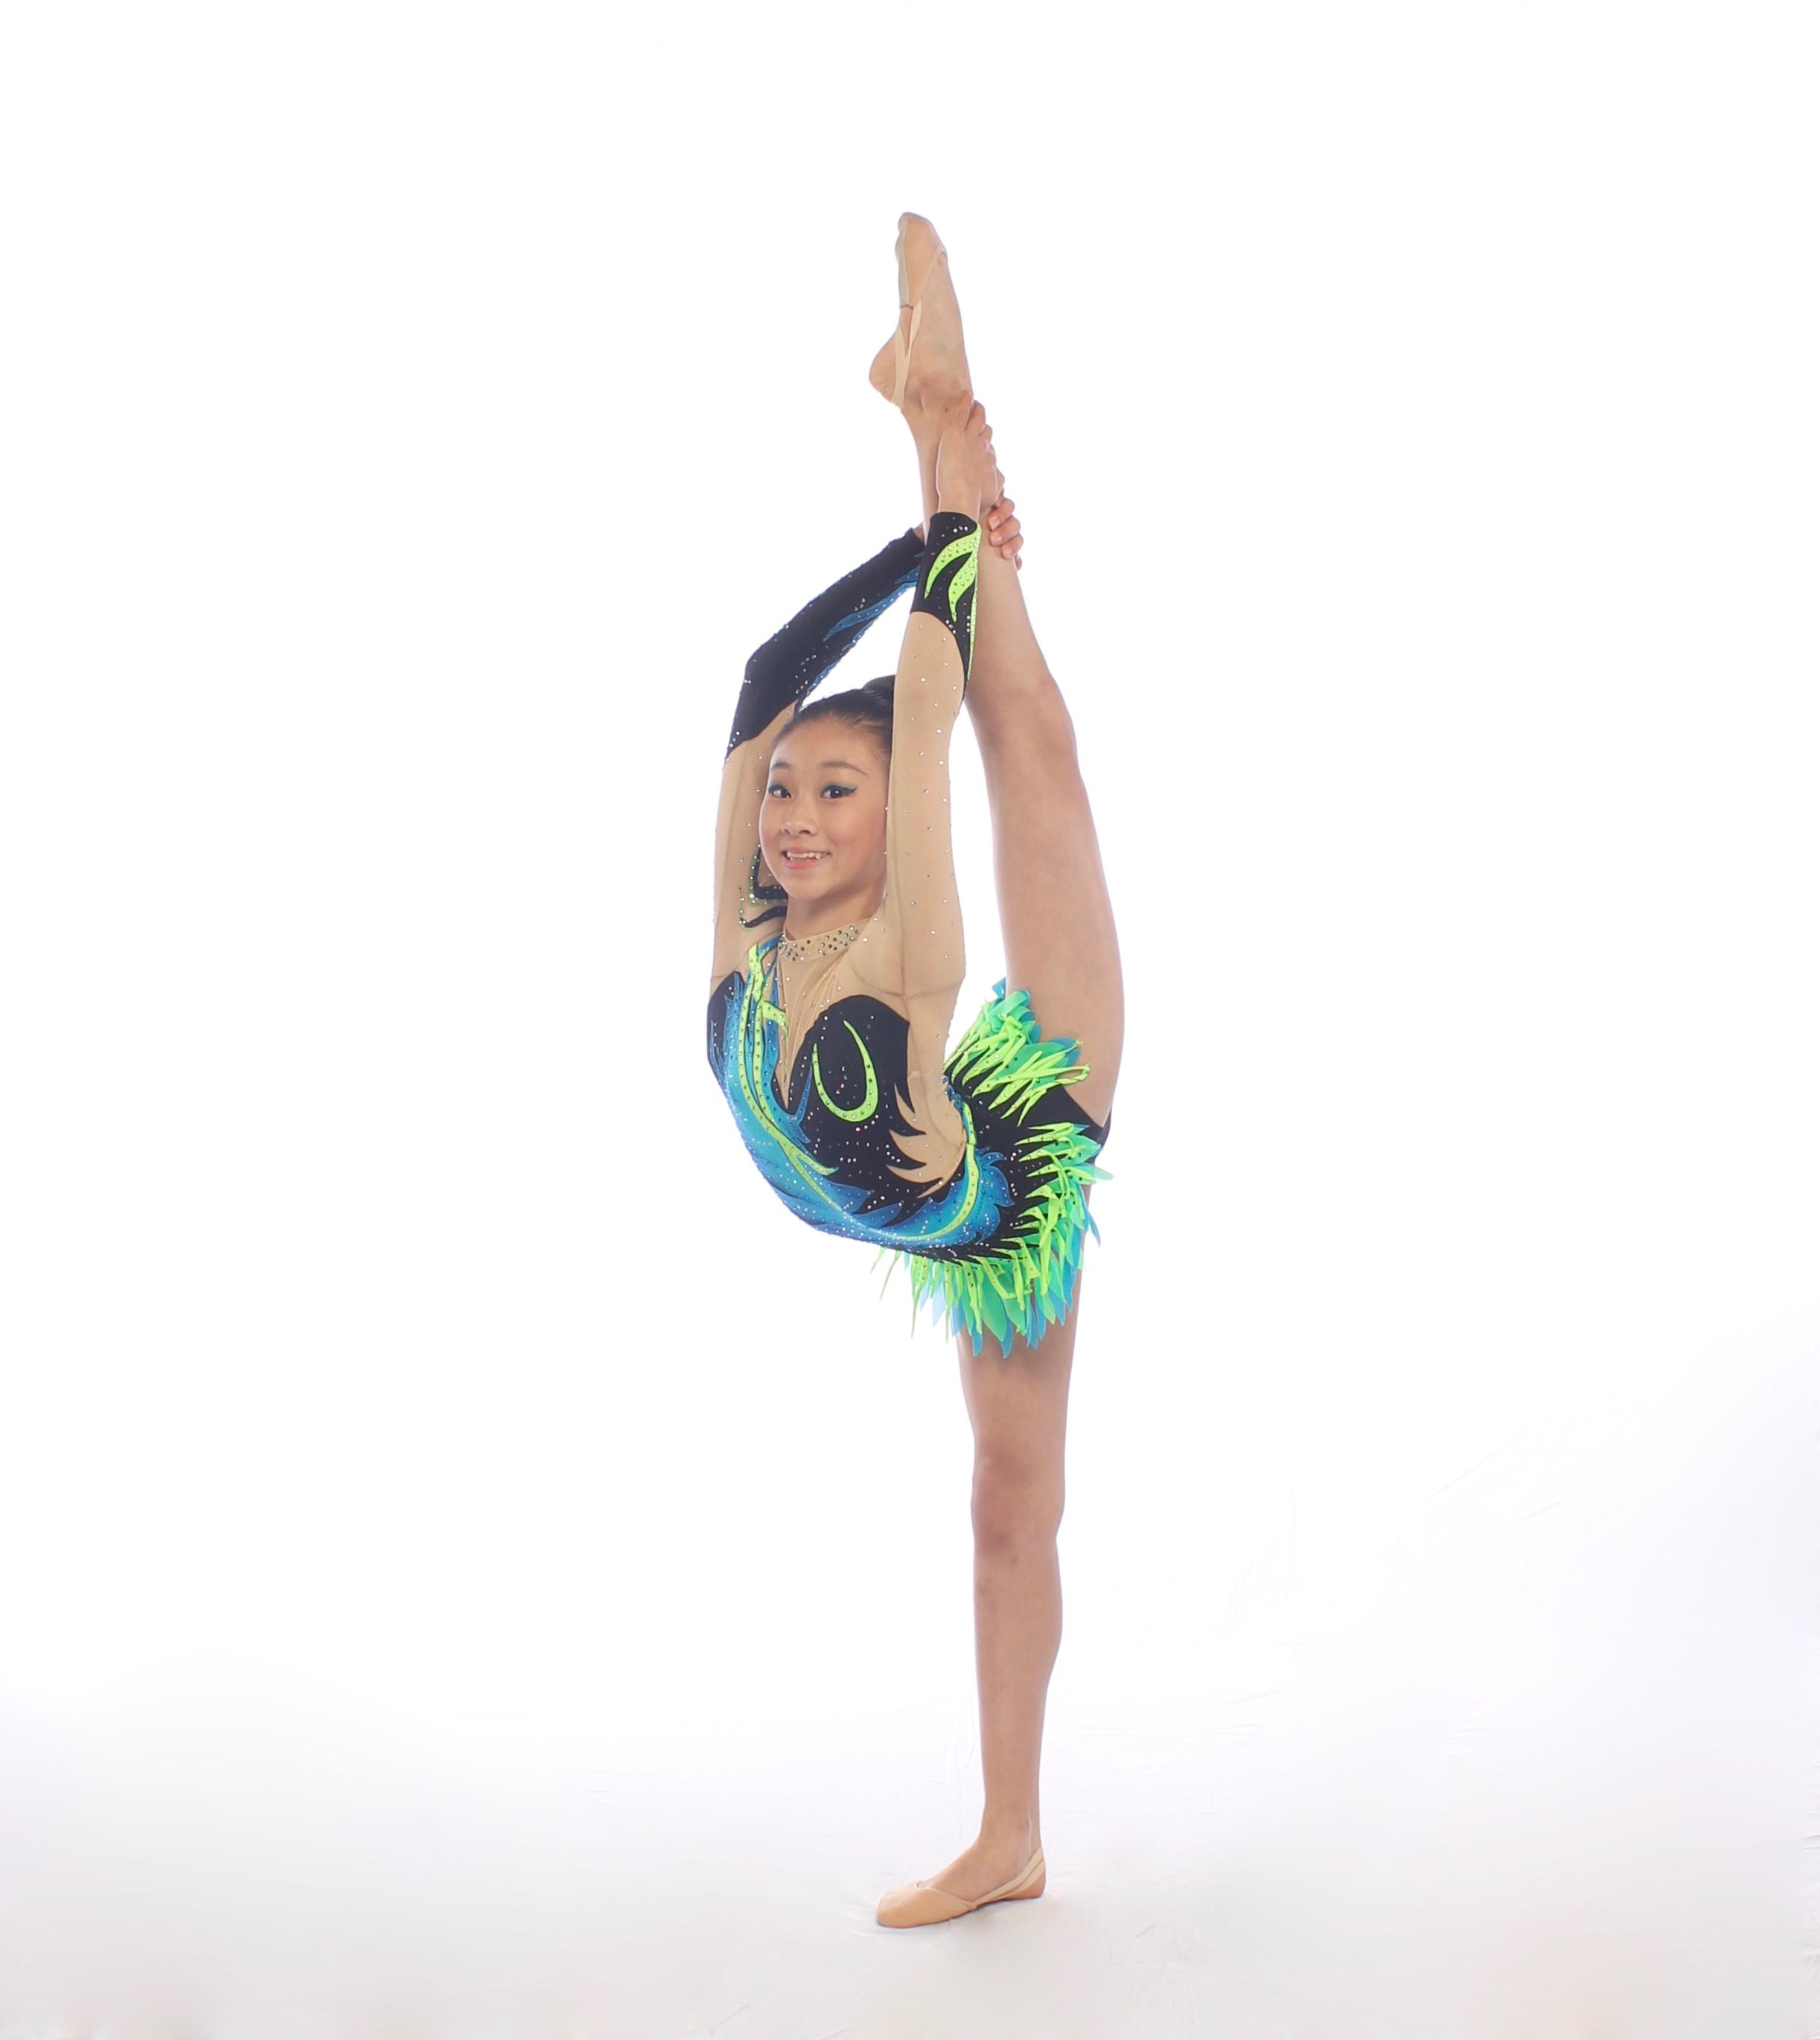 gymnast 4 - 1.jpg